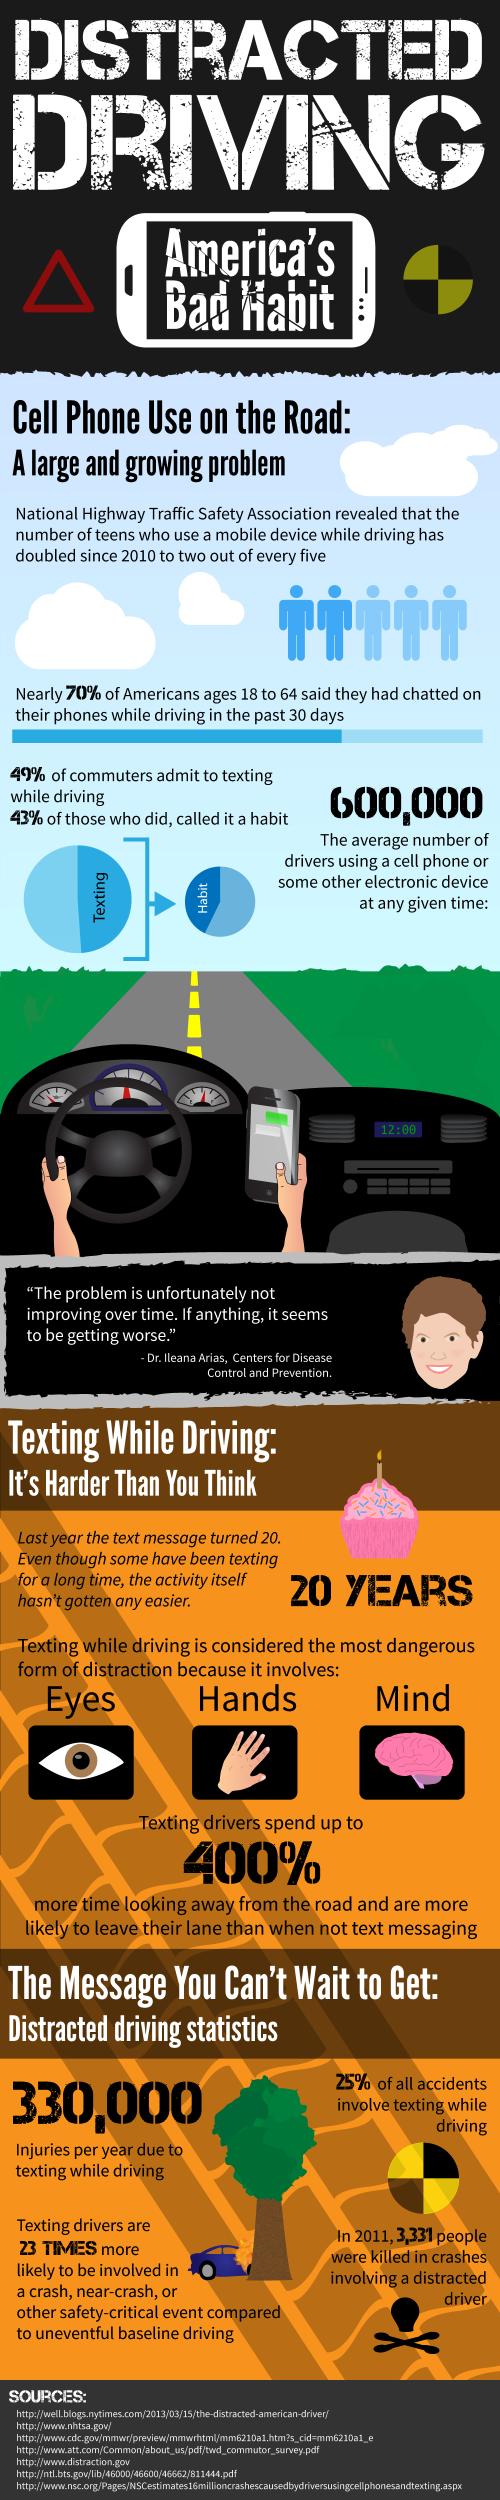 Distracted Driving–America's Bad Habit http-::www.benjamintravis.com:project:distracted-driving